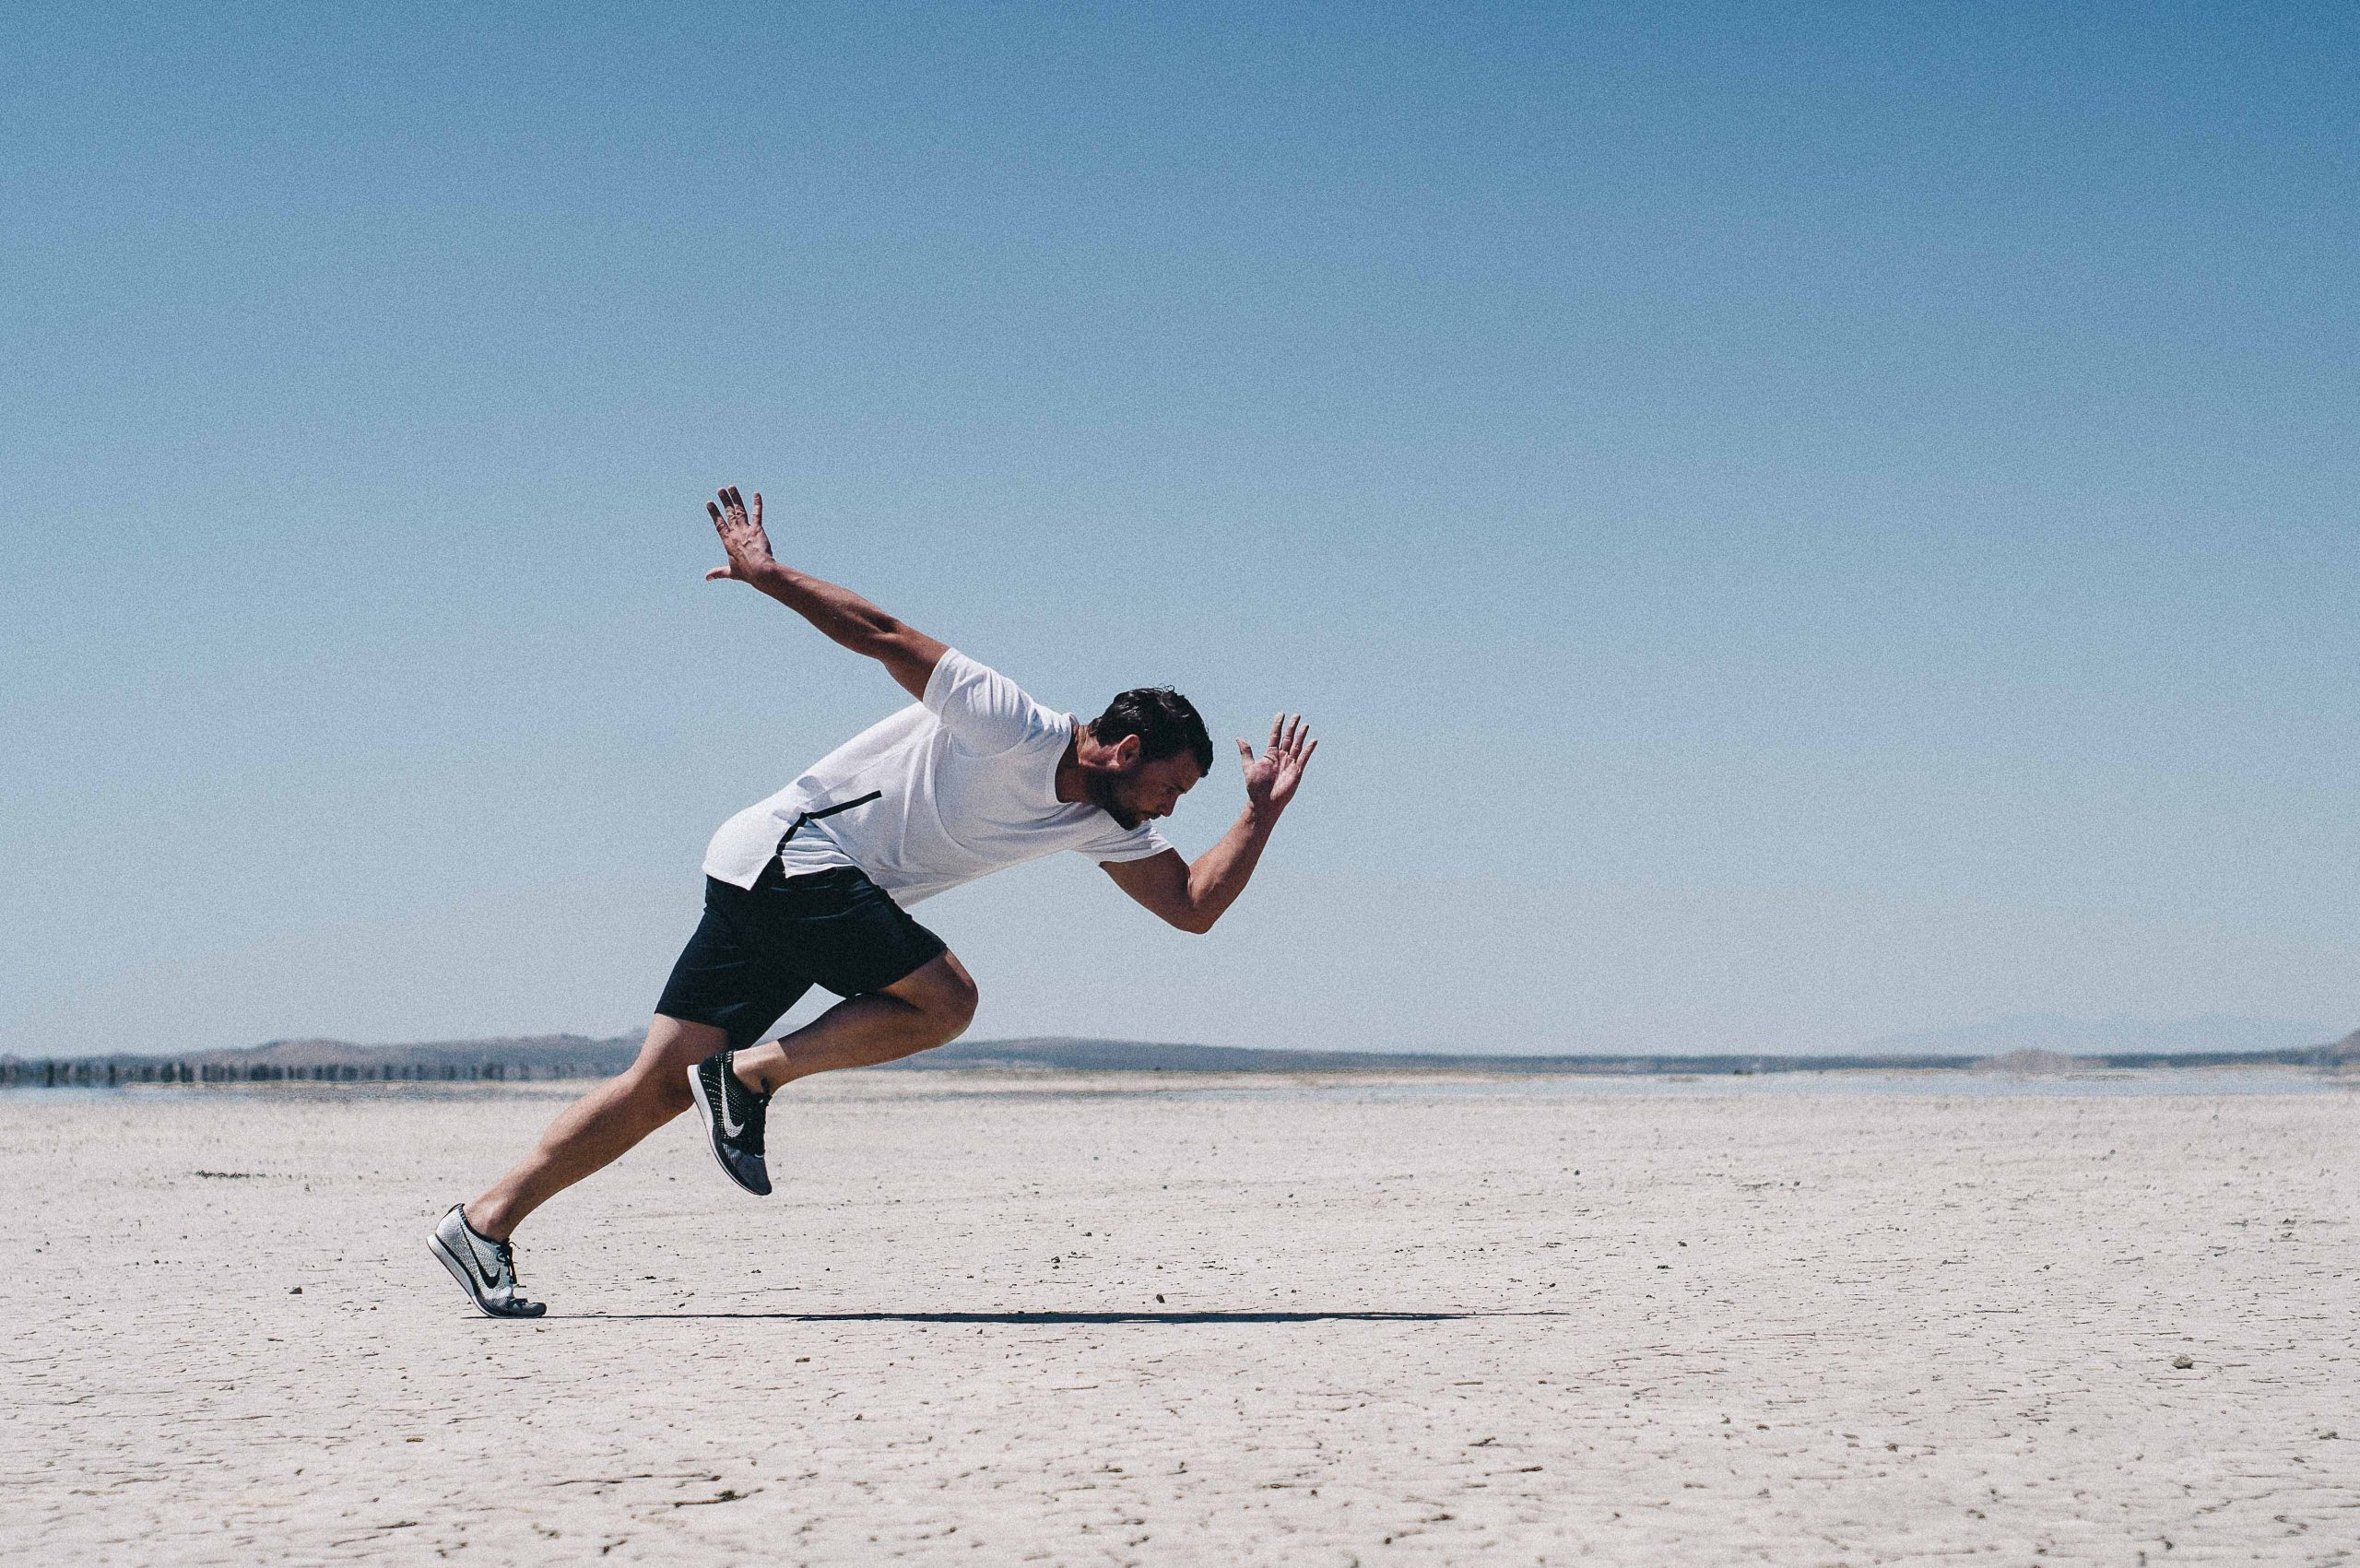 Fix Your Body | Mijn 15 beste mobility tips (incl video)